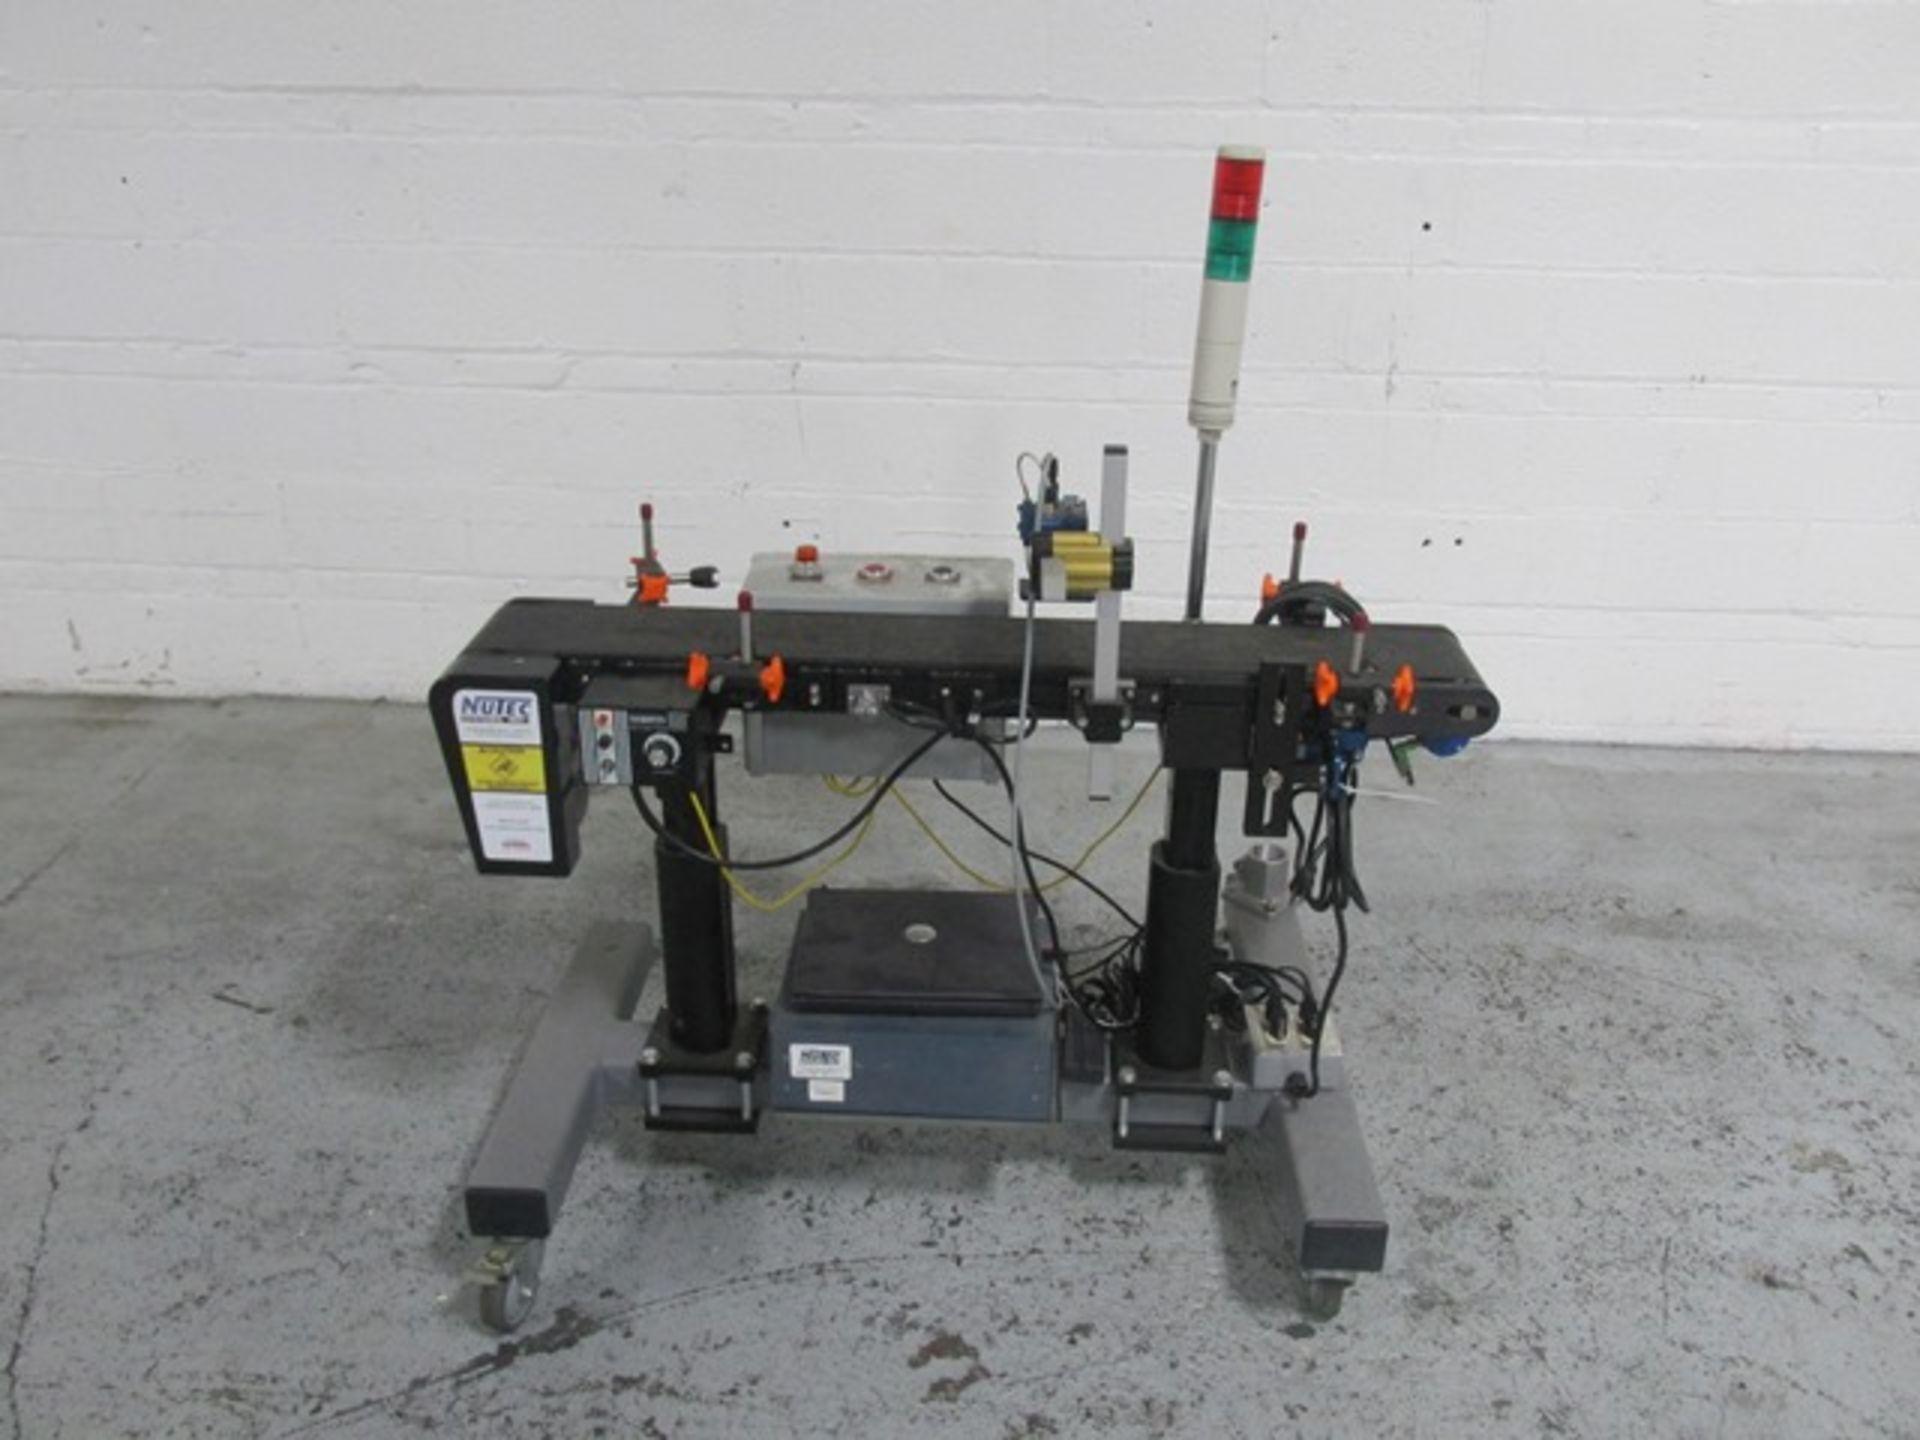 "Lot 23 - Nutech box printer, model RT-1000, with 6"" wide x 48"" belt conveyor, printer head, serial# 05004."